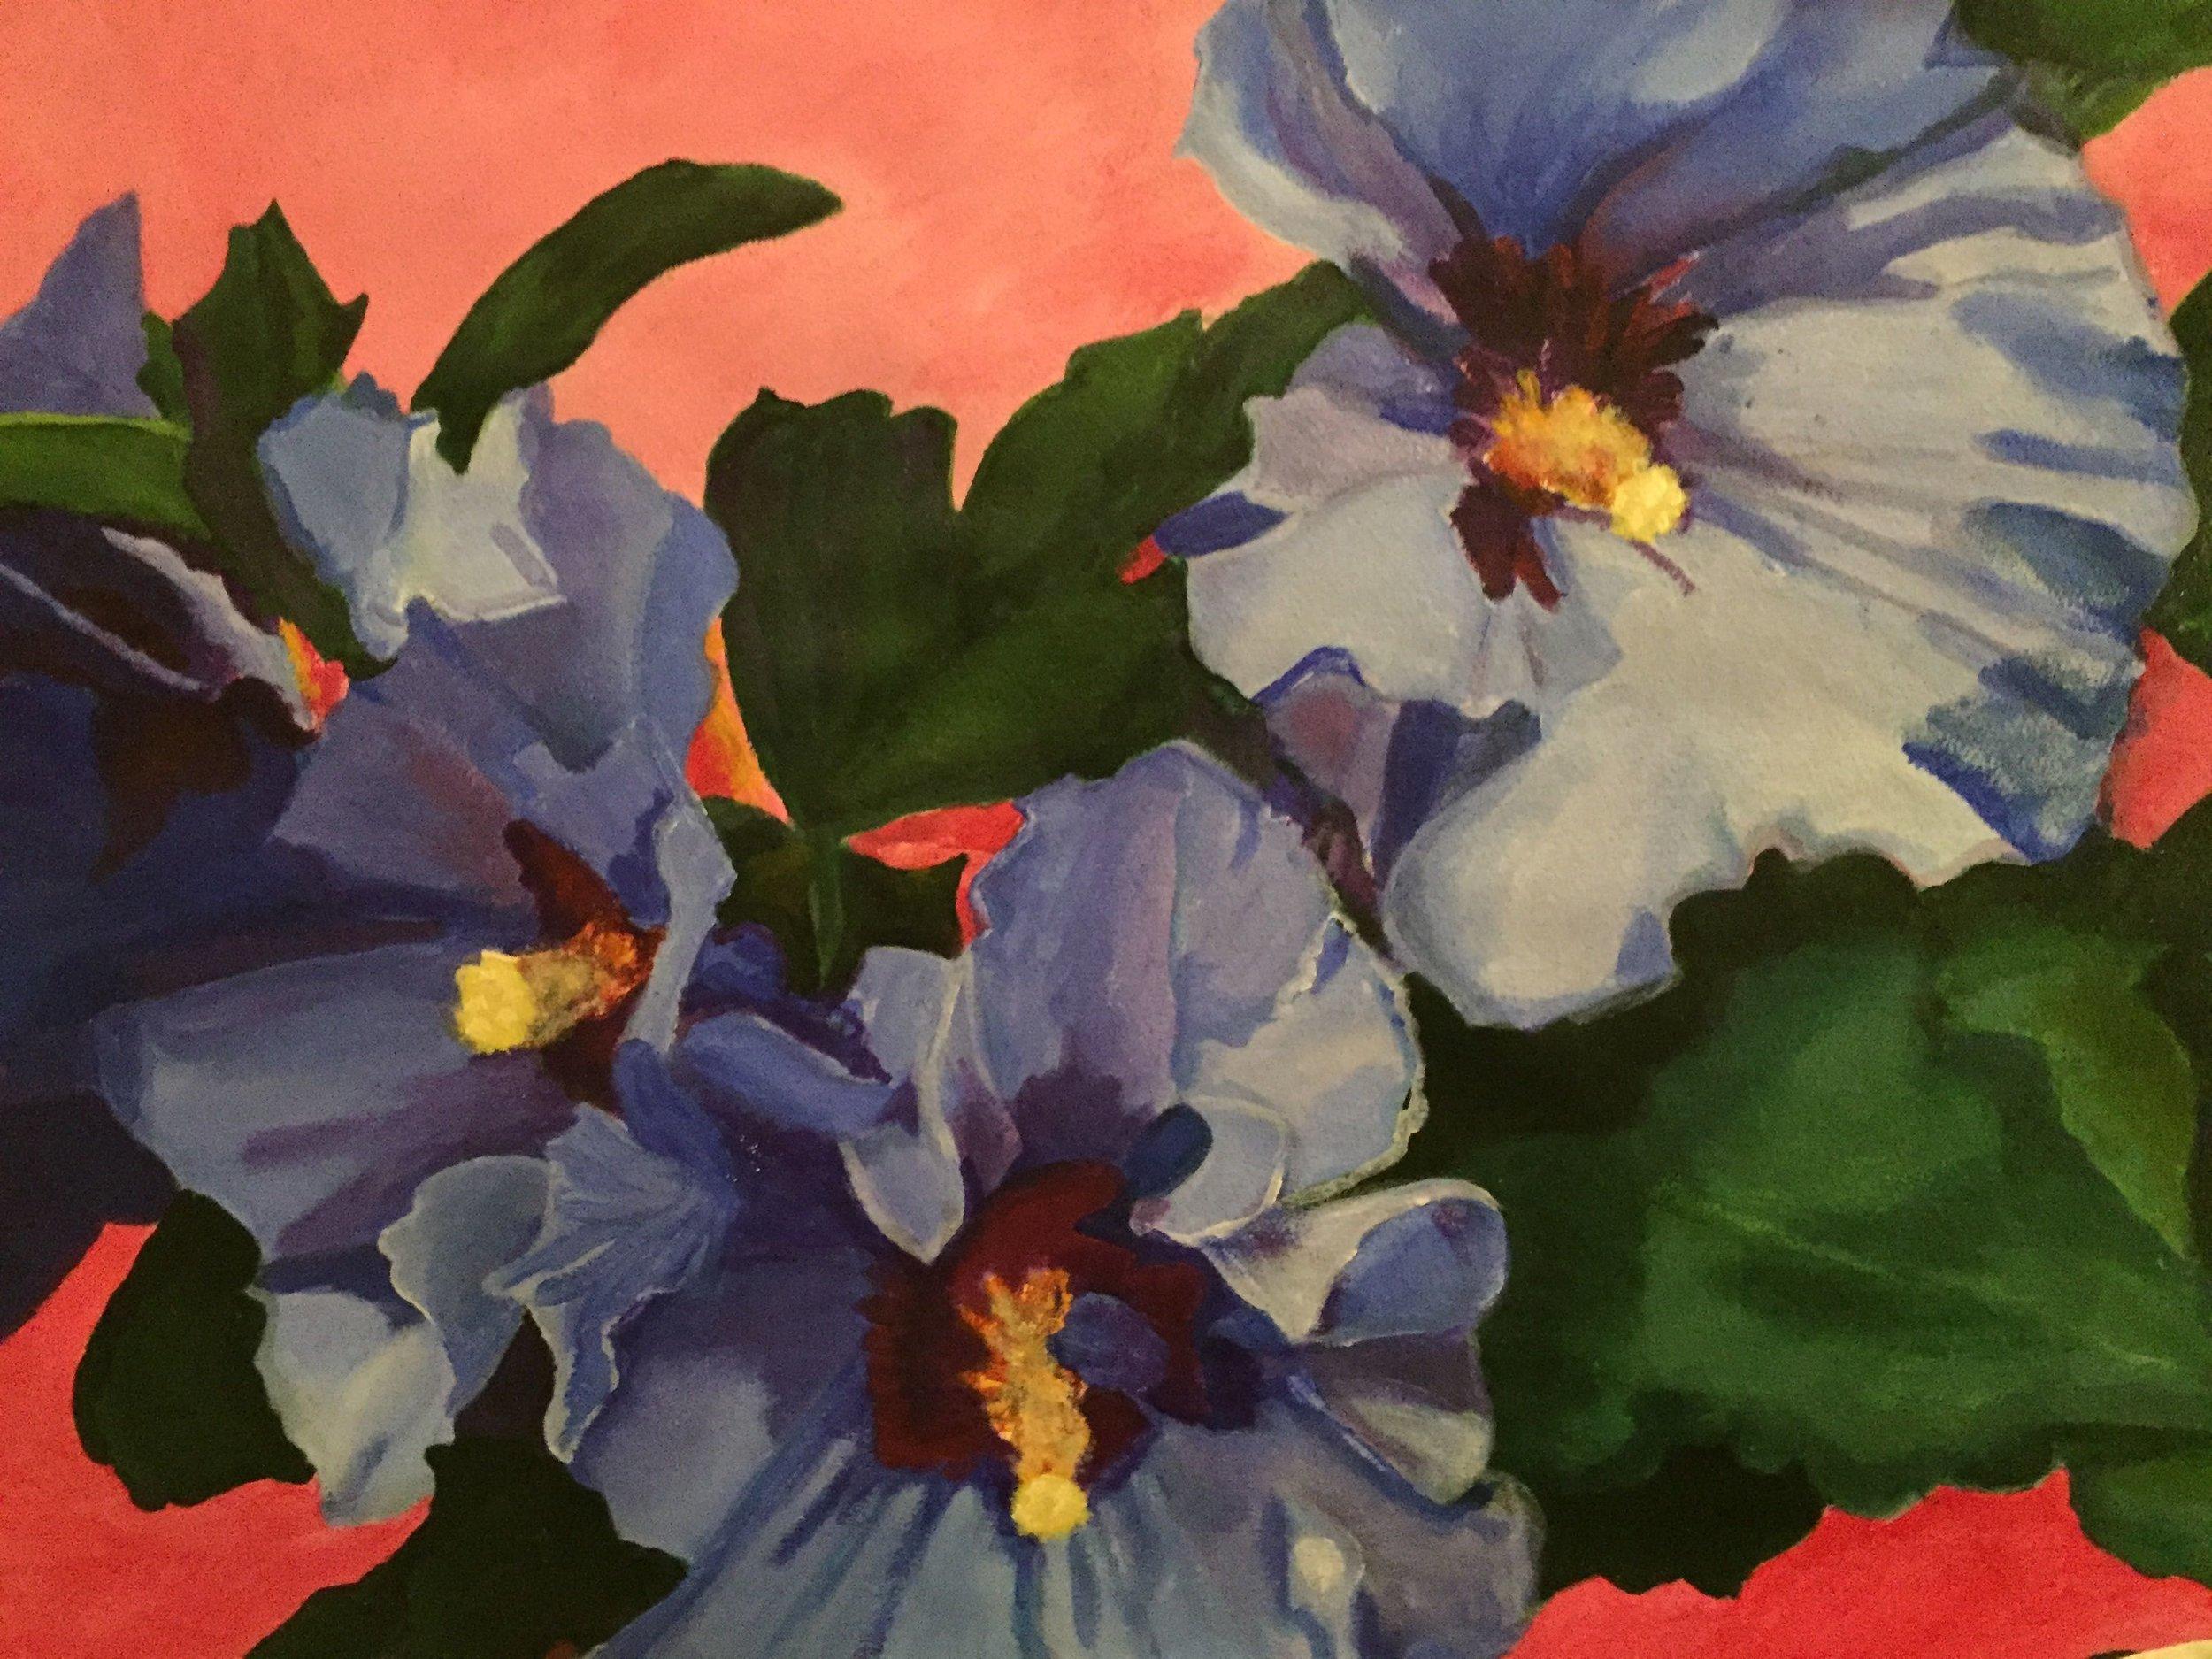 Hibiscus syracuse Blue Bird2016ca 2x3' acrylic on paper  $3000